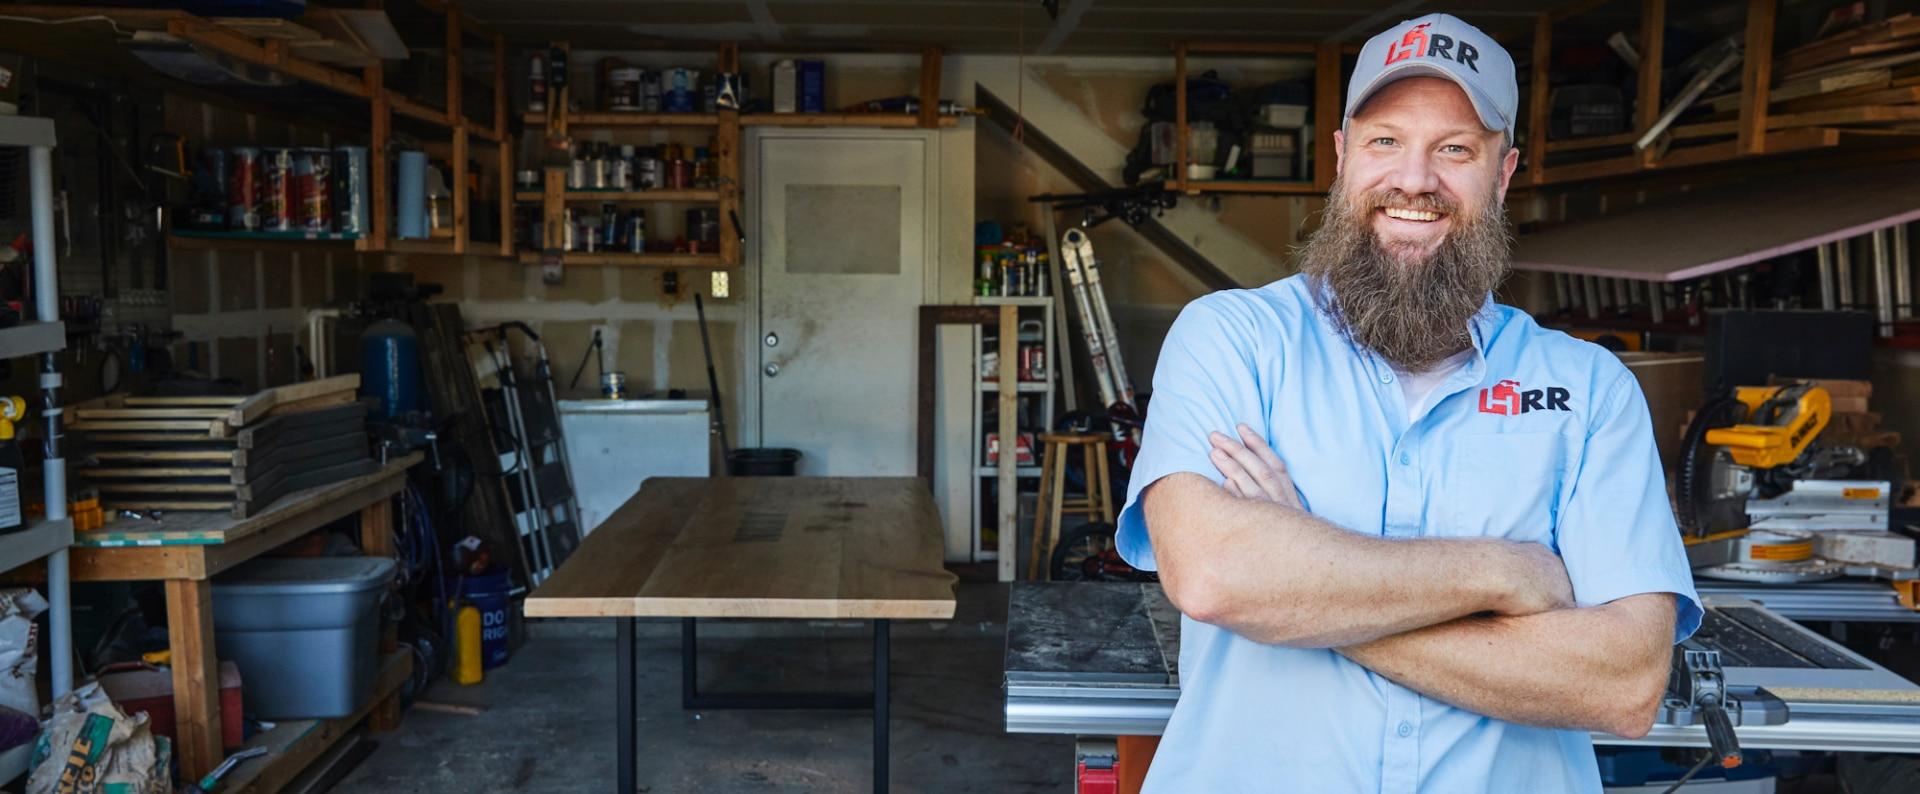 Tim Hardin, Hardin Handyman Services - Built By Business